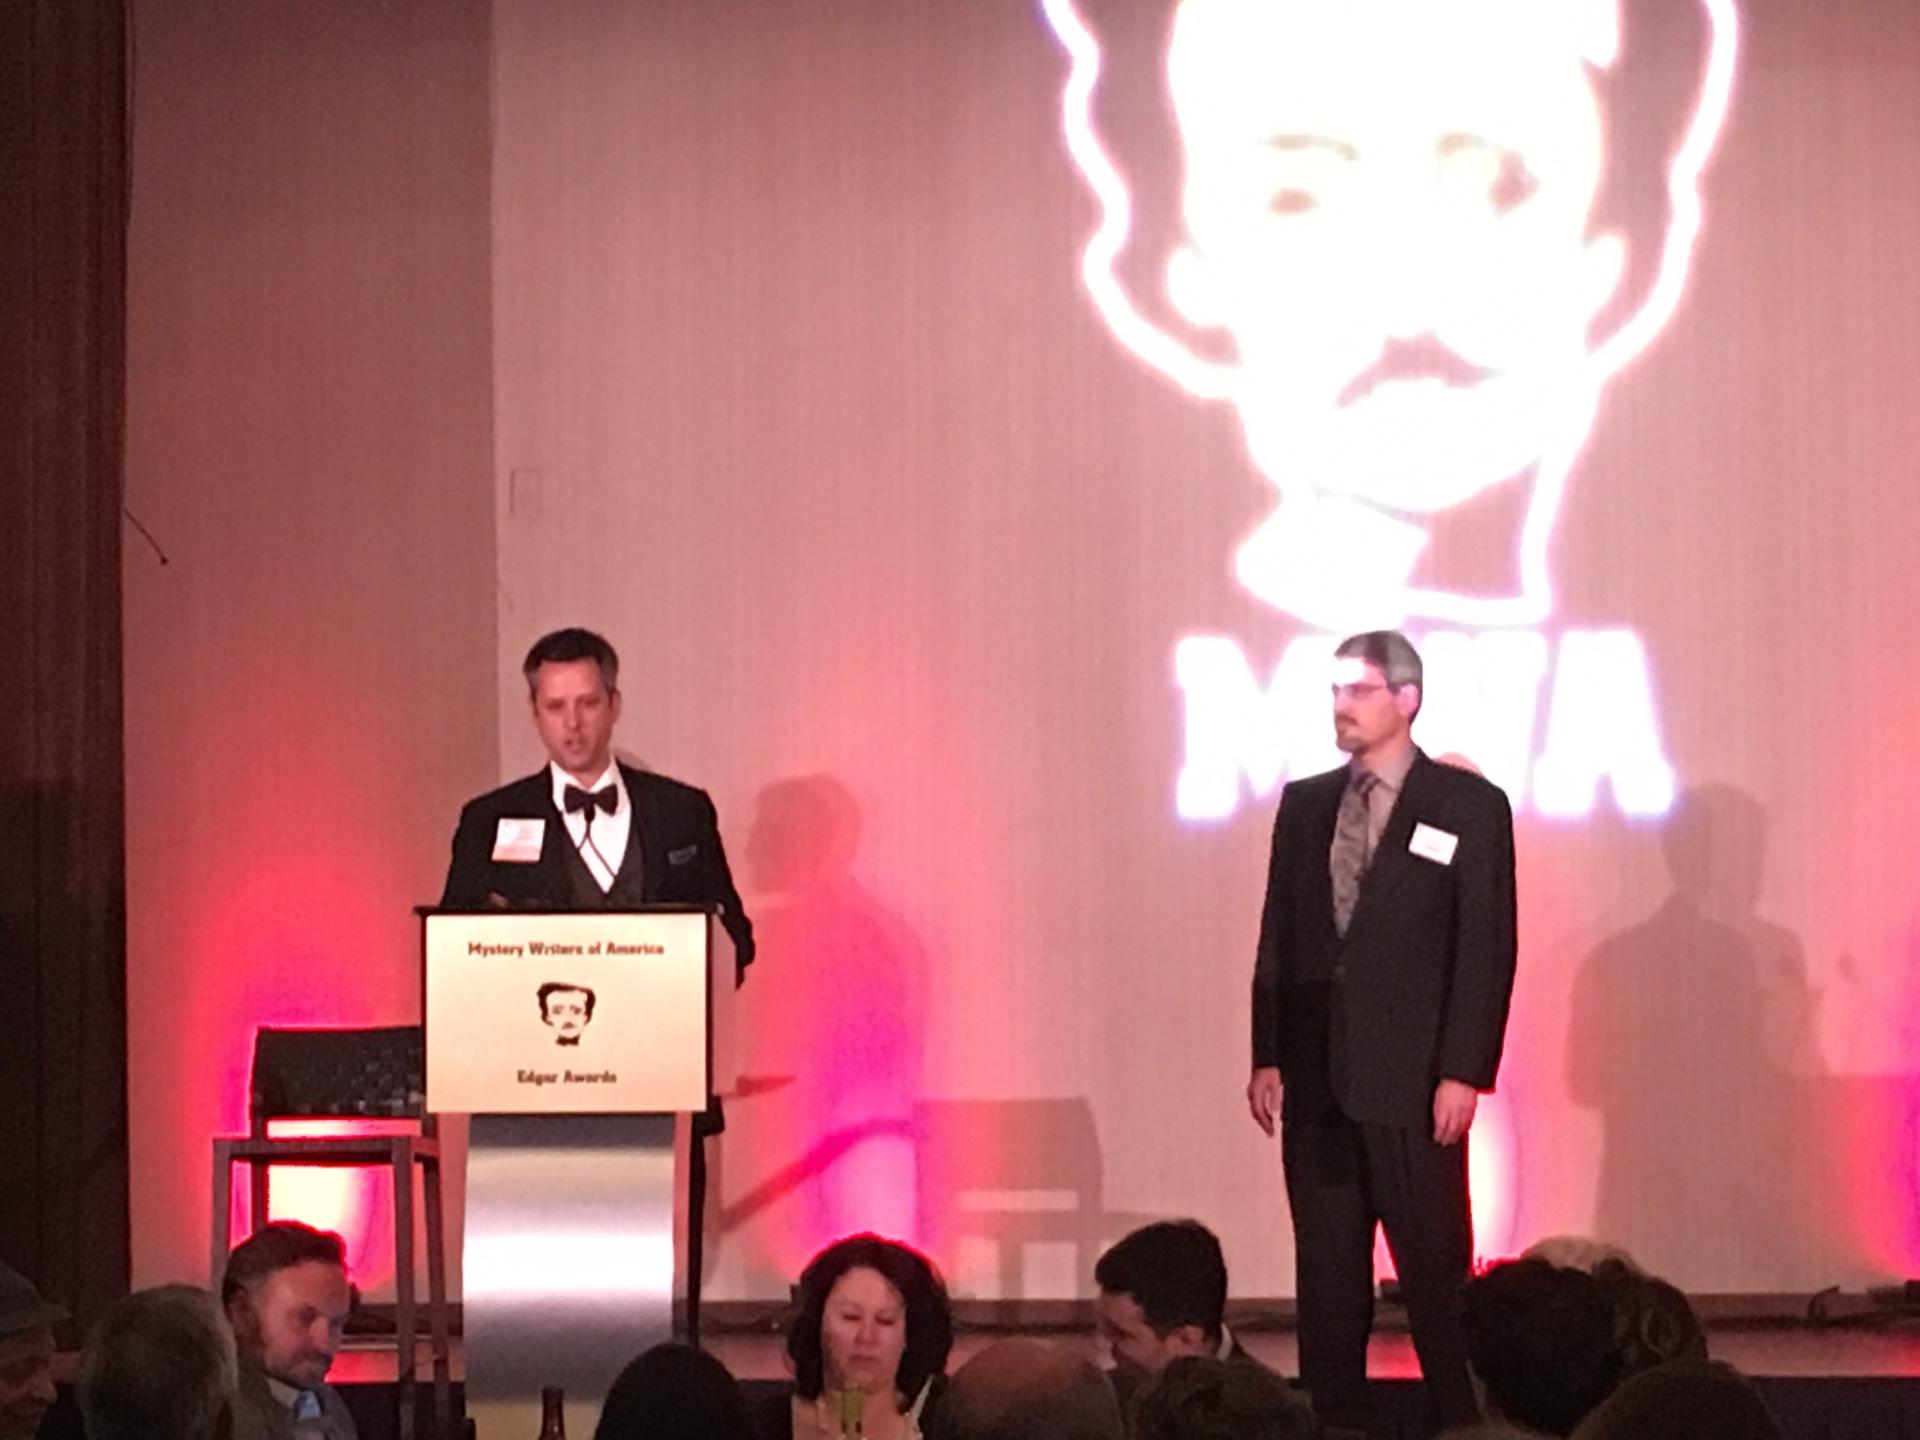 Russell W. Johnson Award